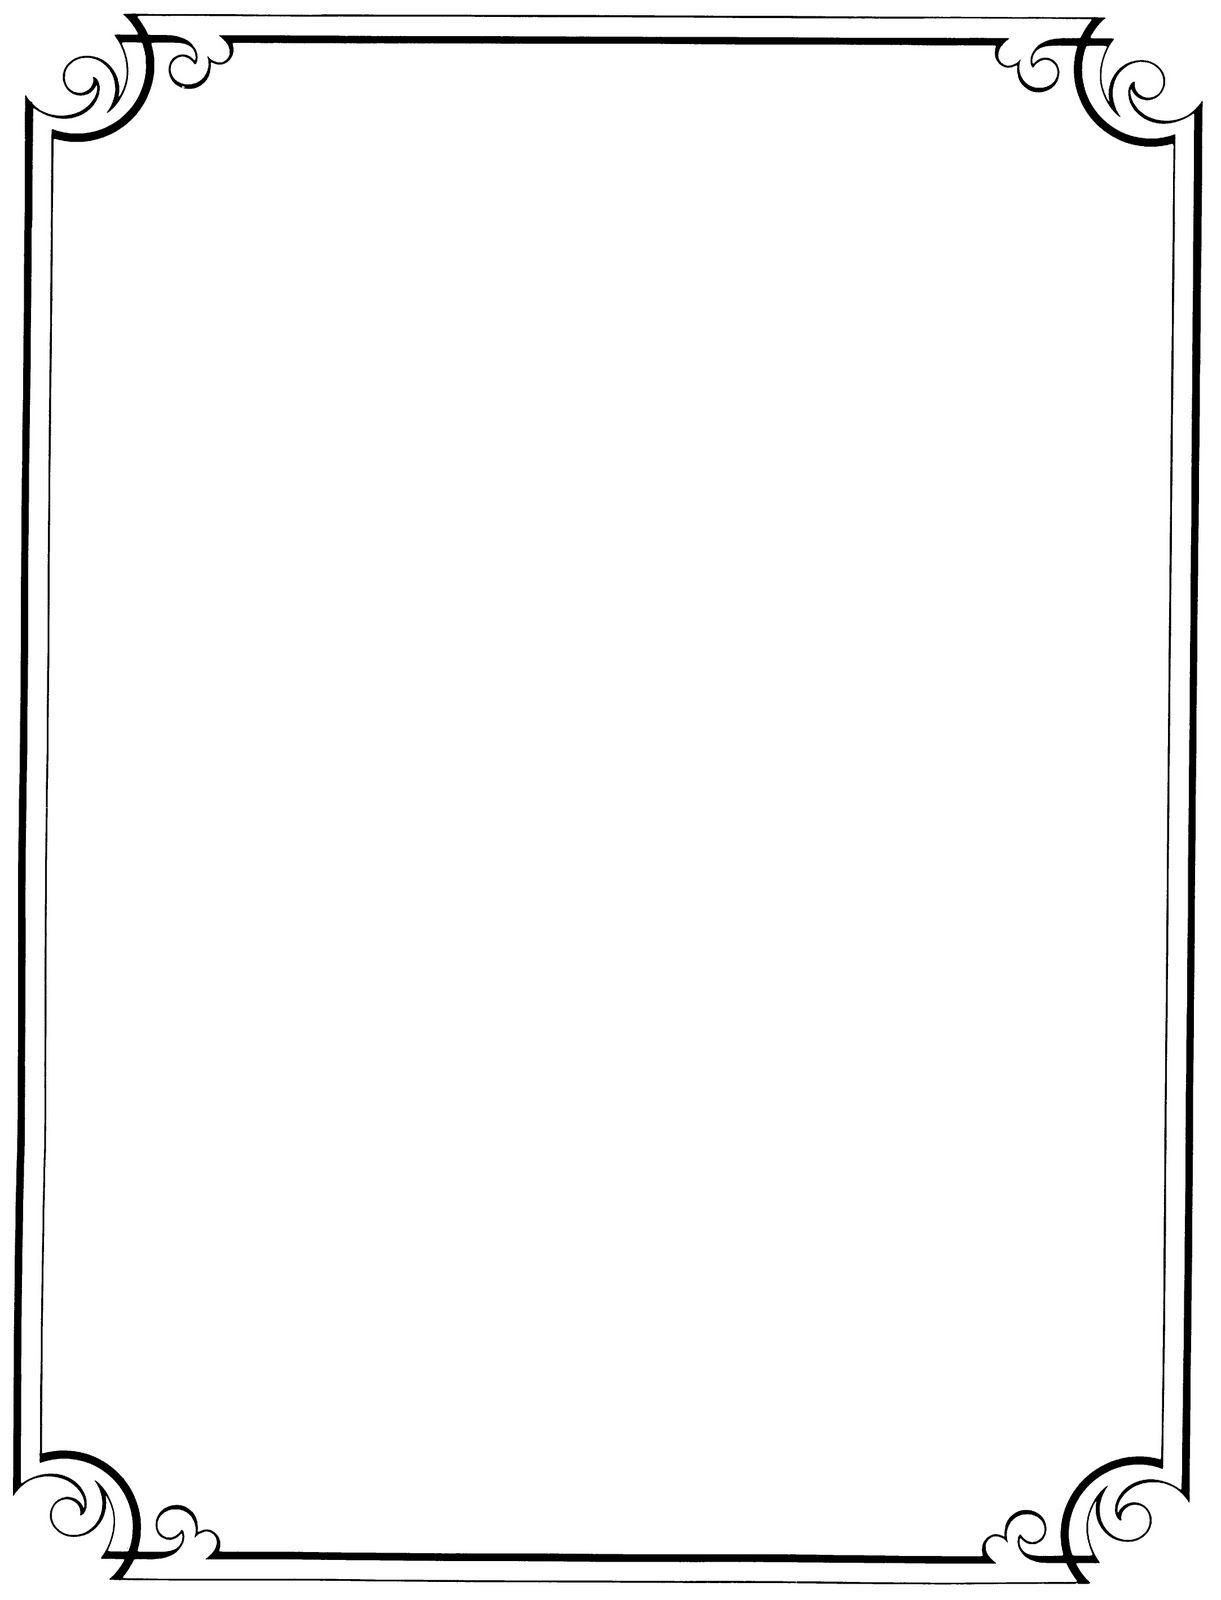 Free Printable Clip Art Borders    : Free Vintage Clip Art - Free Printable Borders